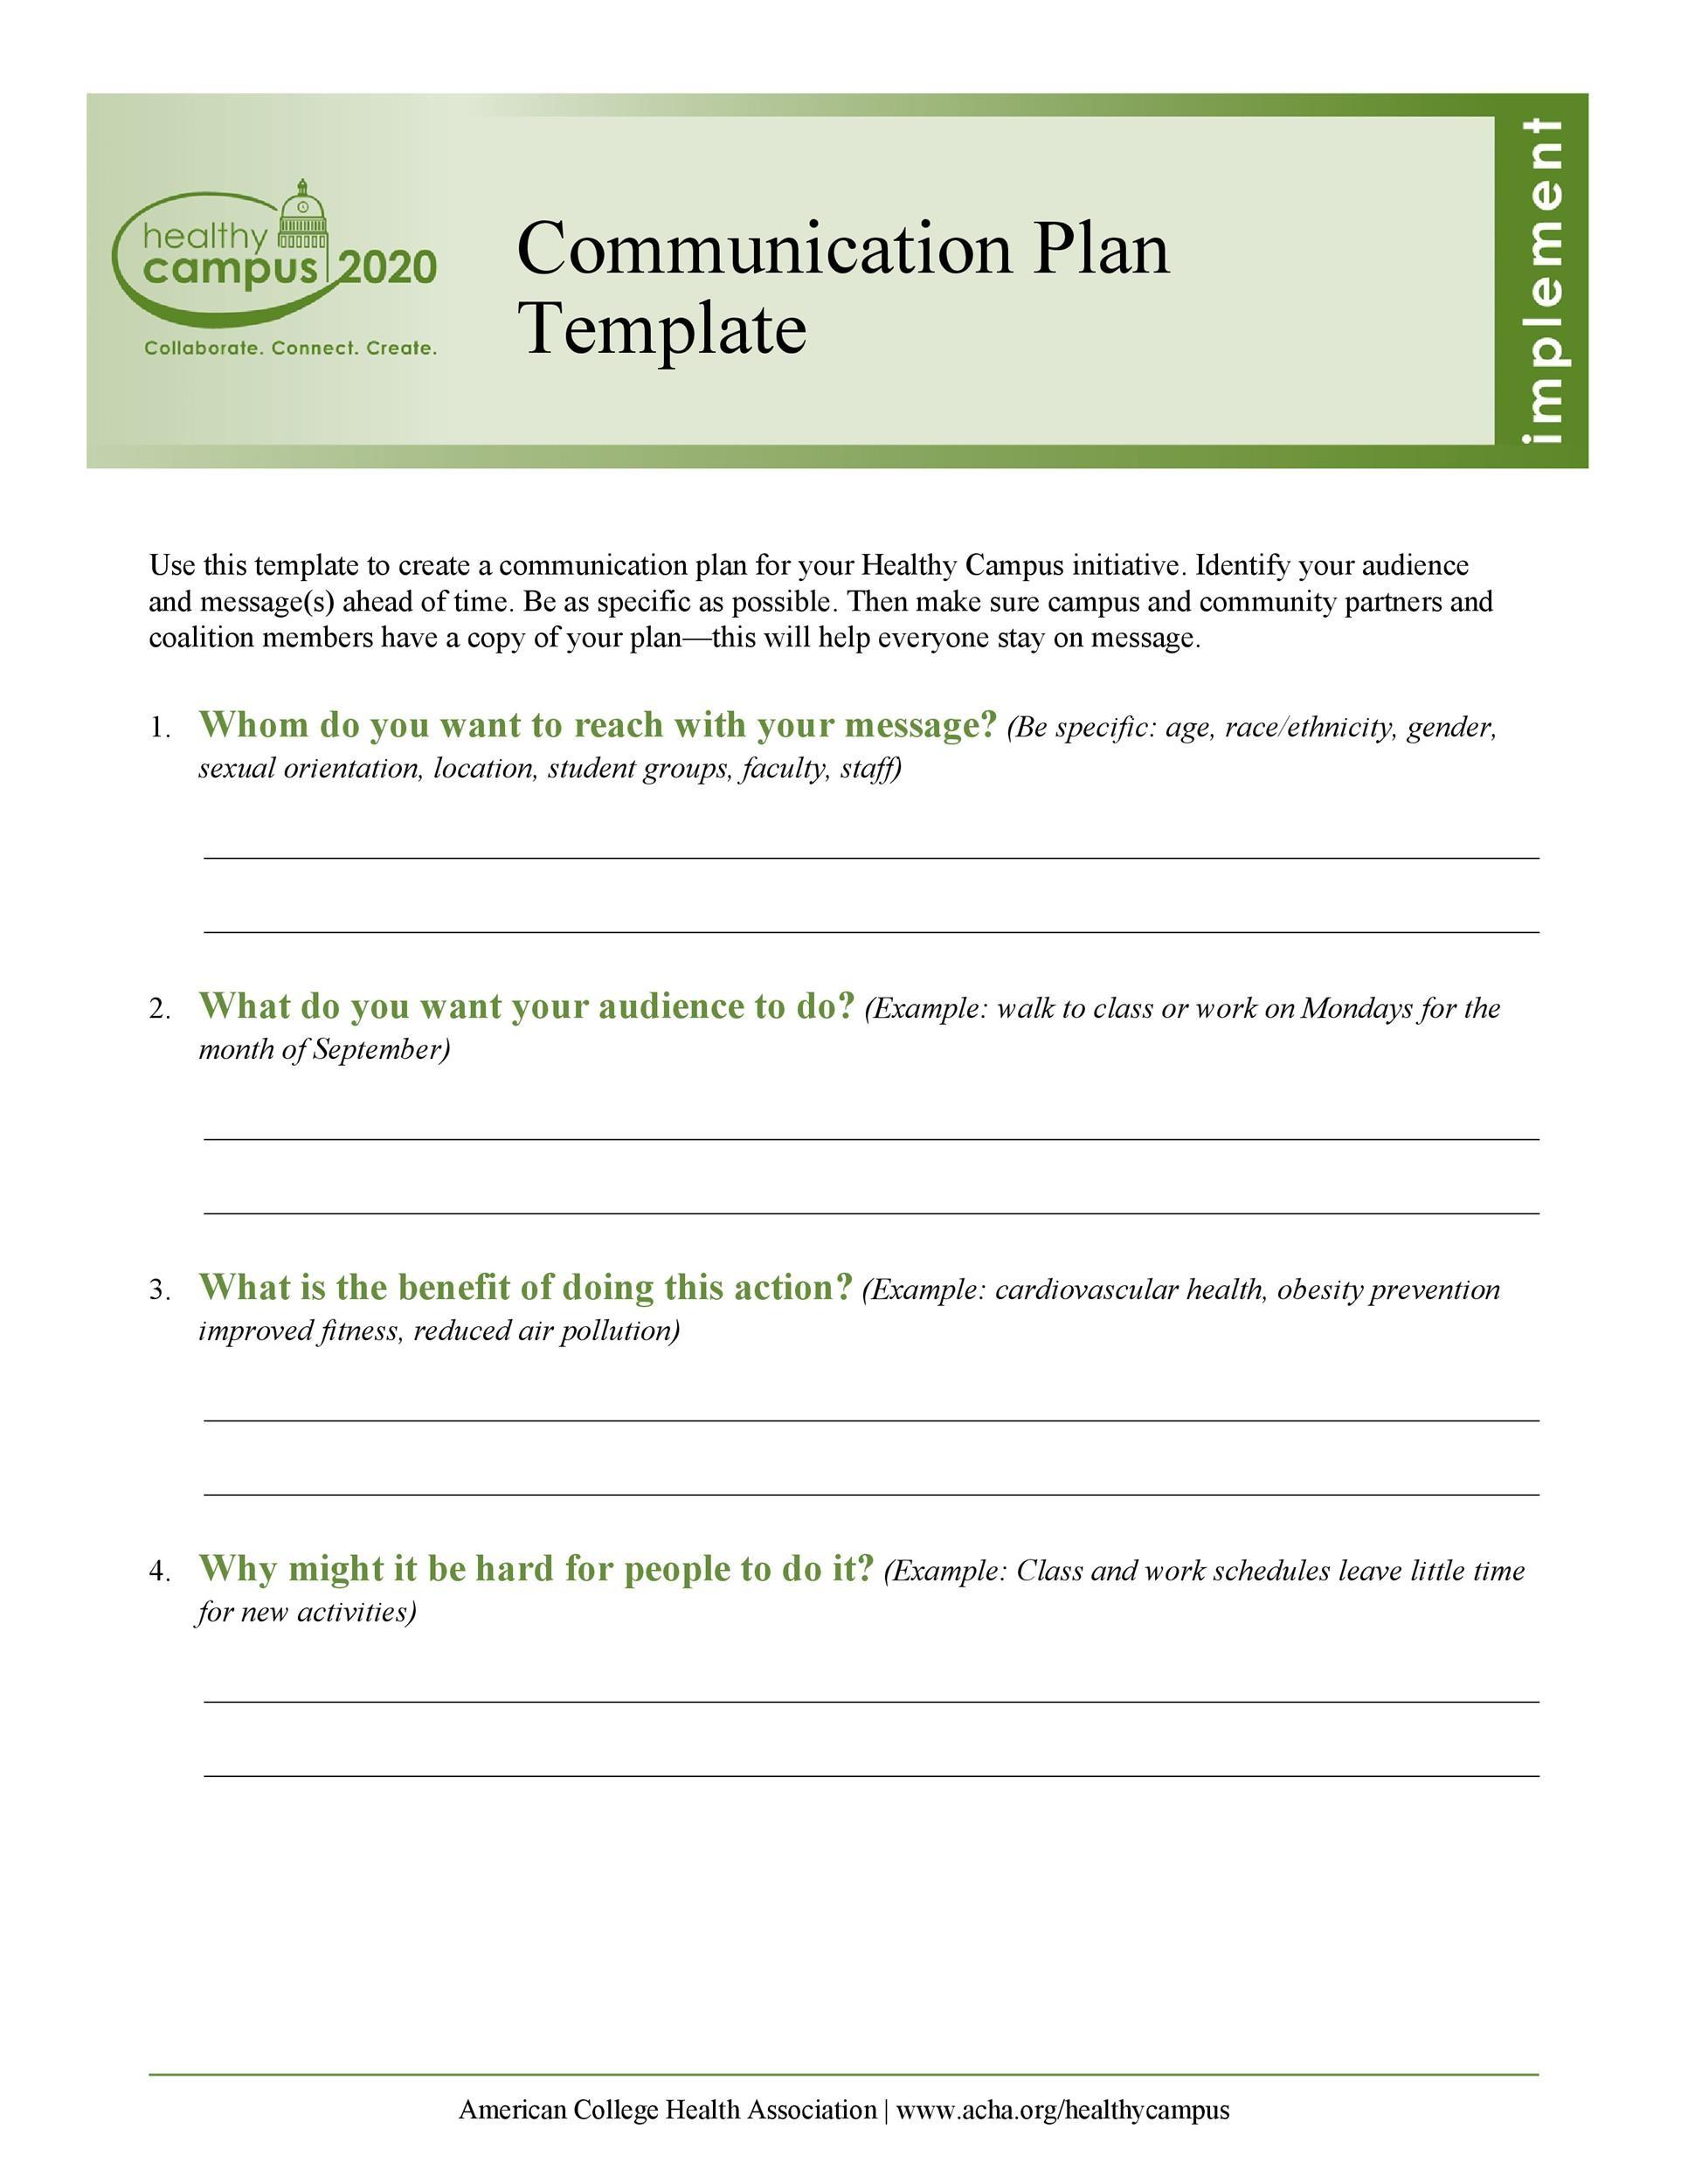 Free Communication Plan Template 04